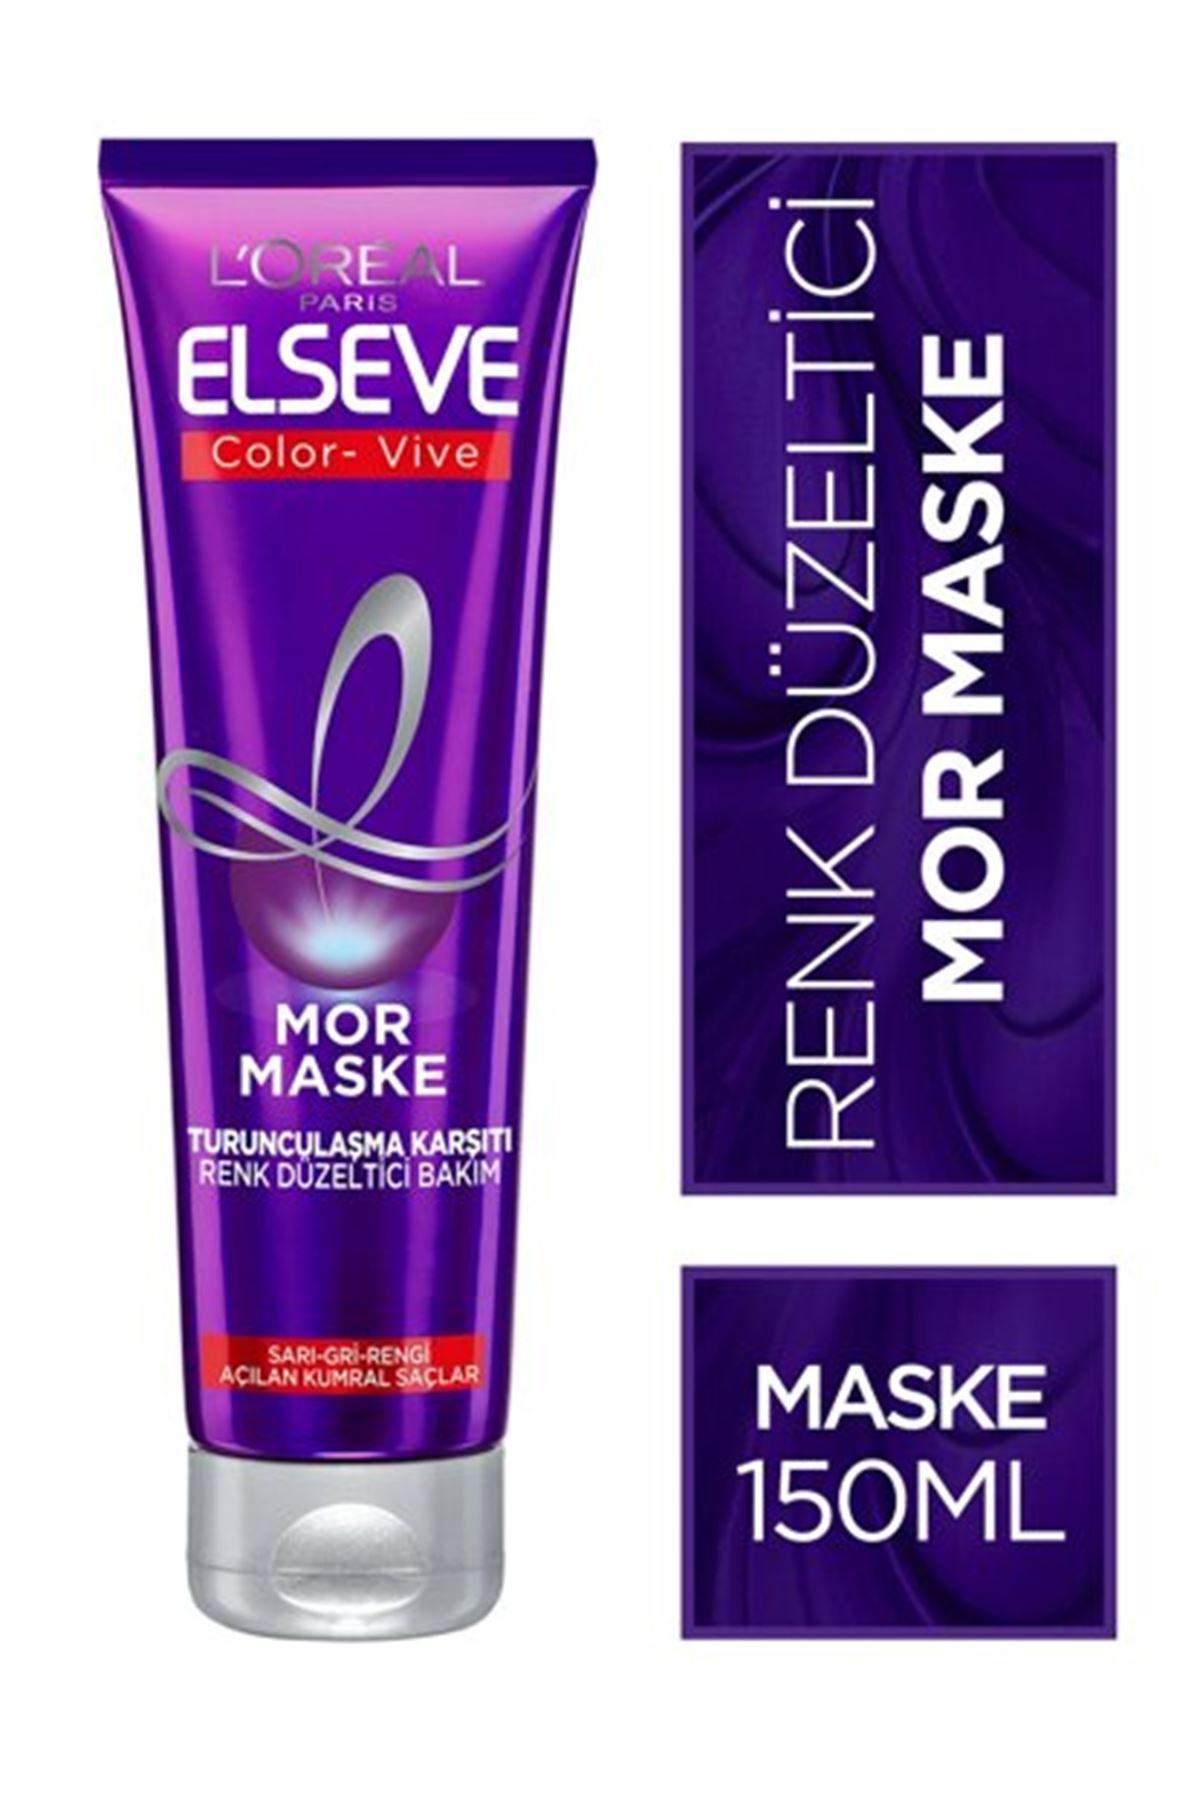 Loreal Paris Elseve Color-vive Purple Maske Silver Mor Maske 150 ml.